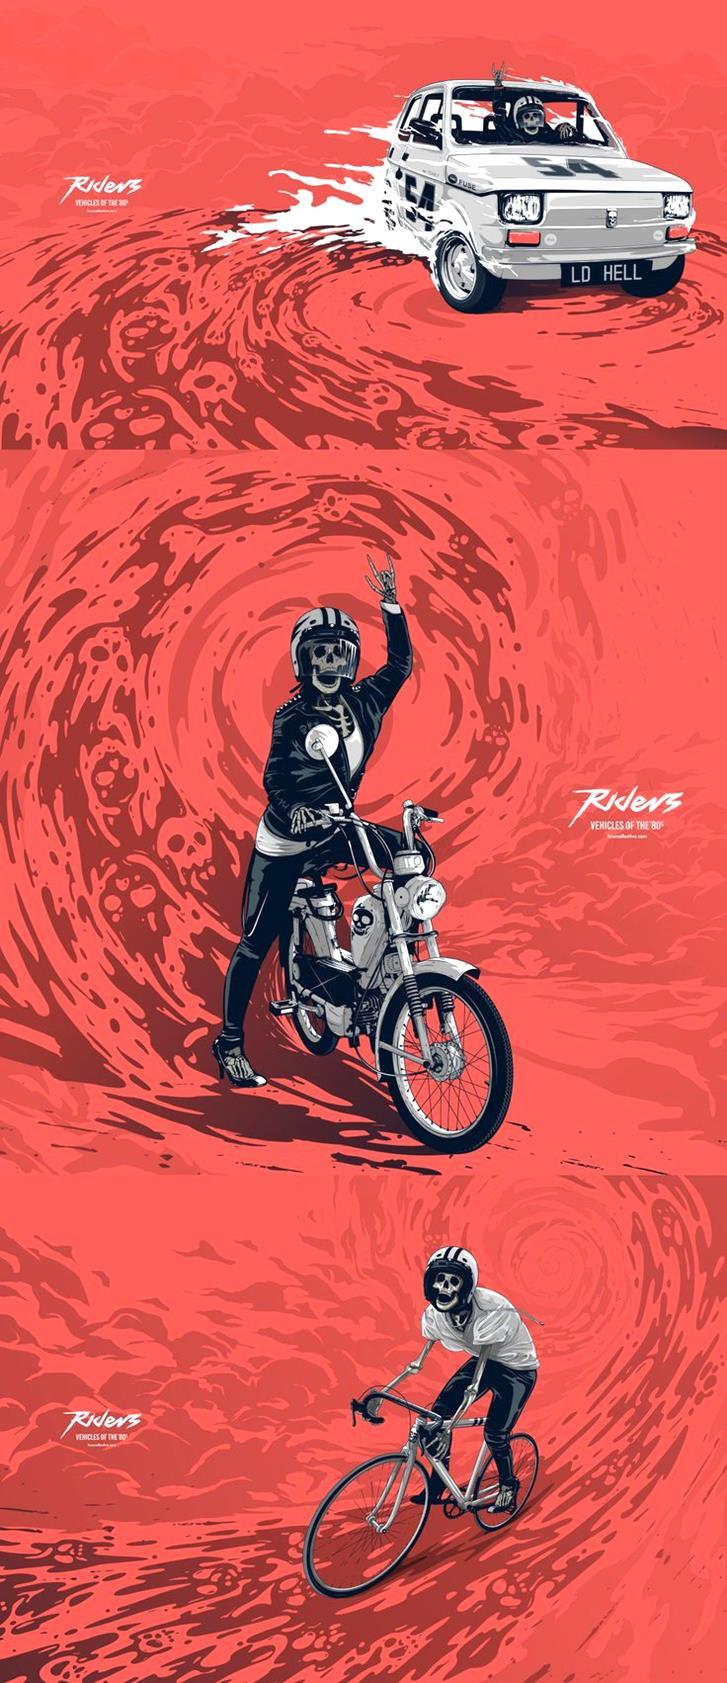 e54cf-Stunning-illustrations-design-top-artists